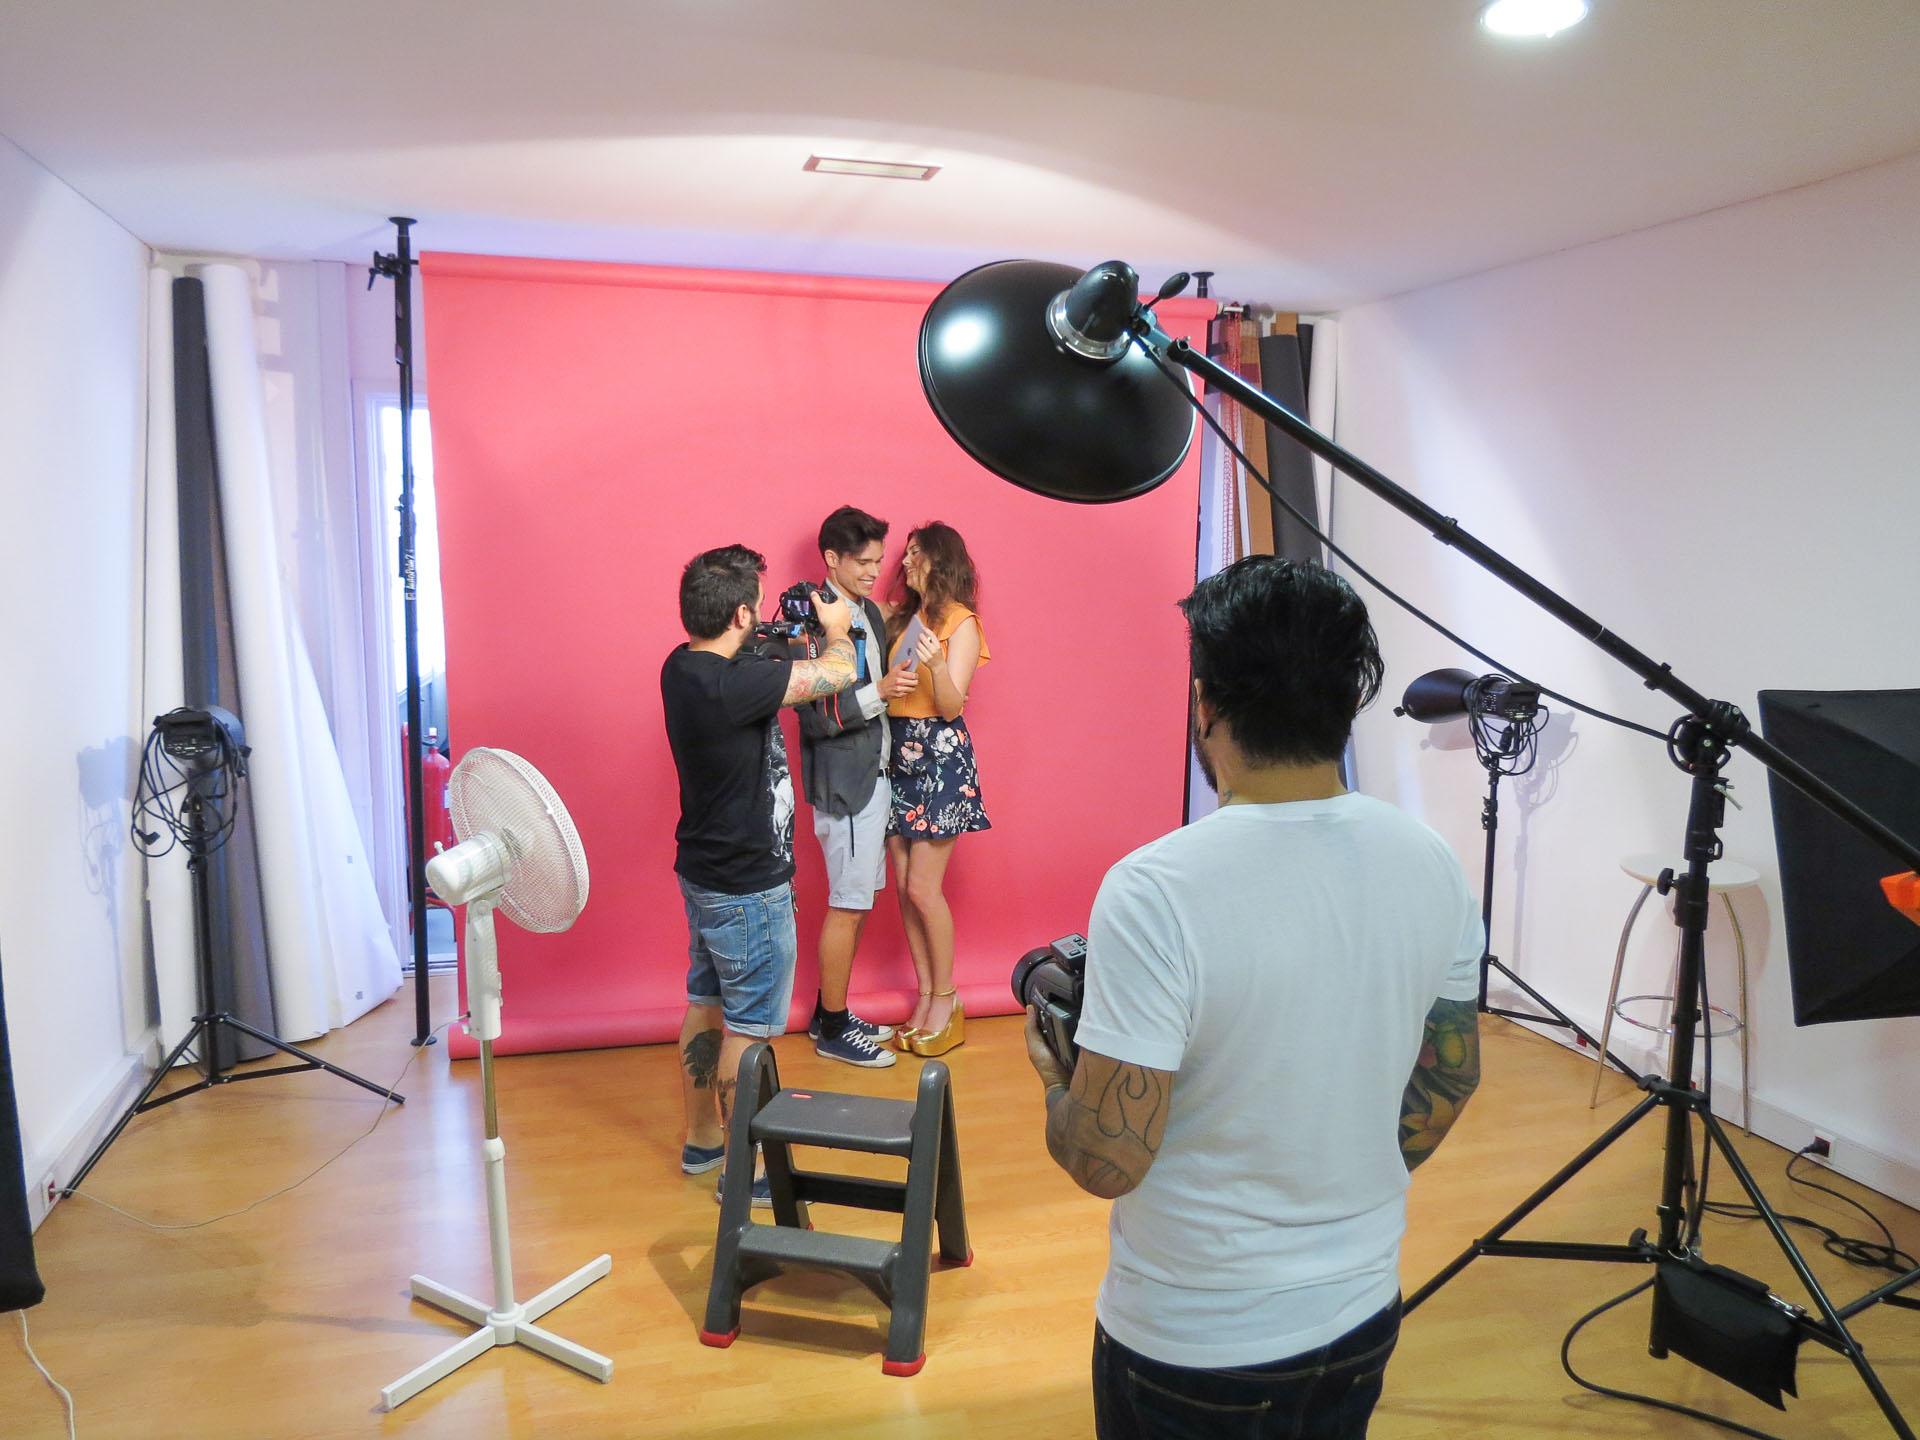 alugar estúdio de fotografia